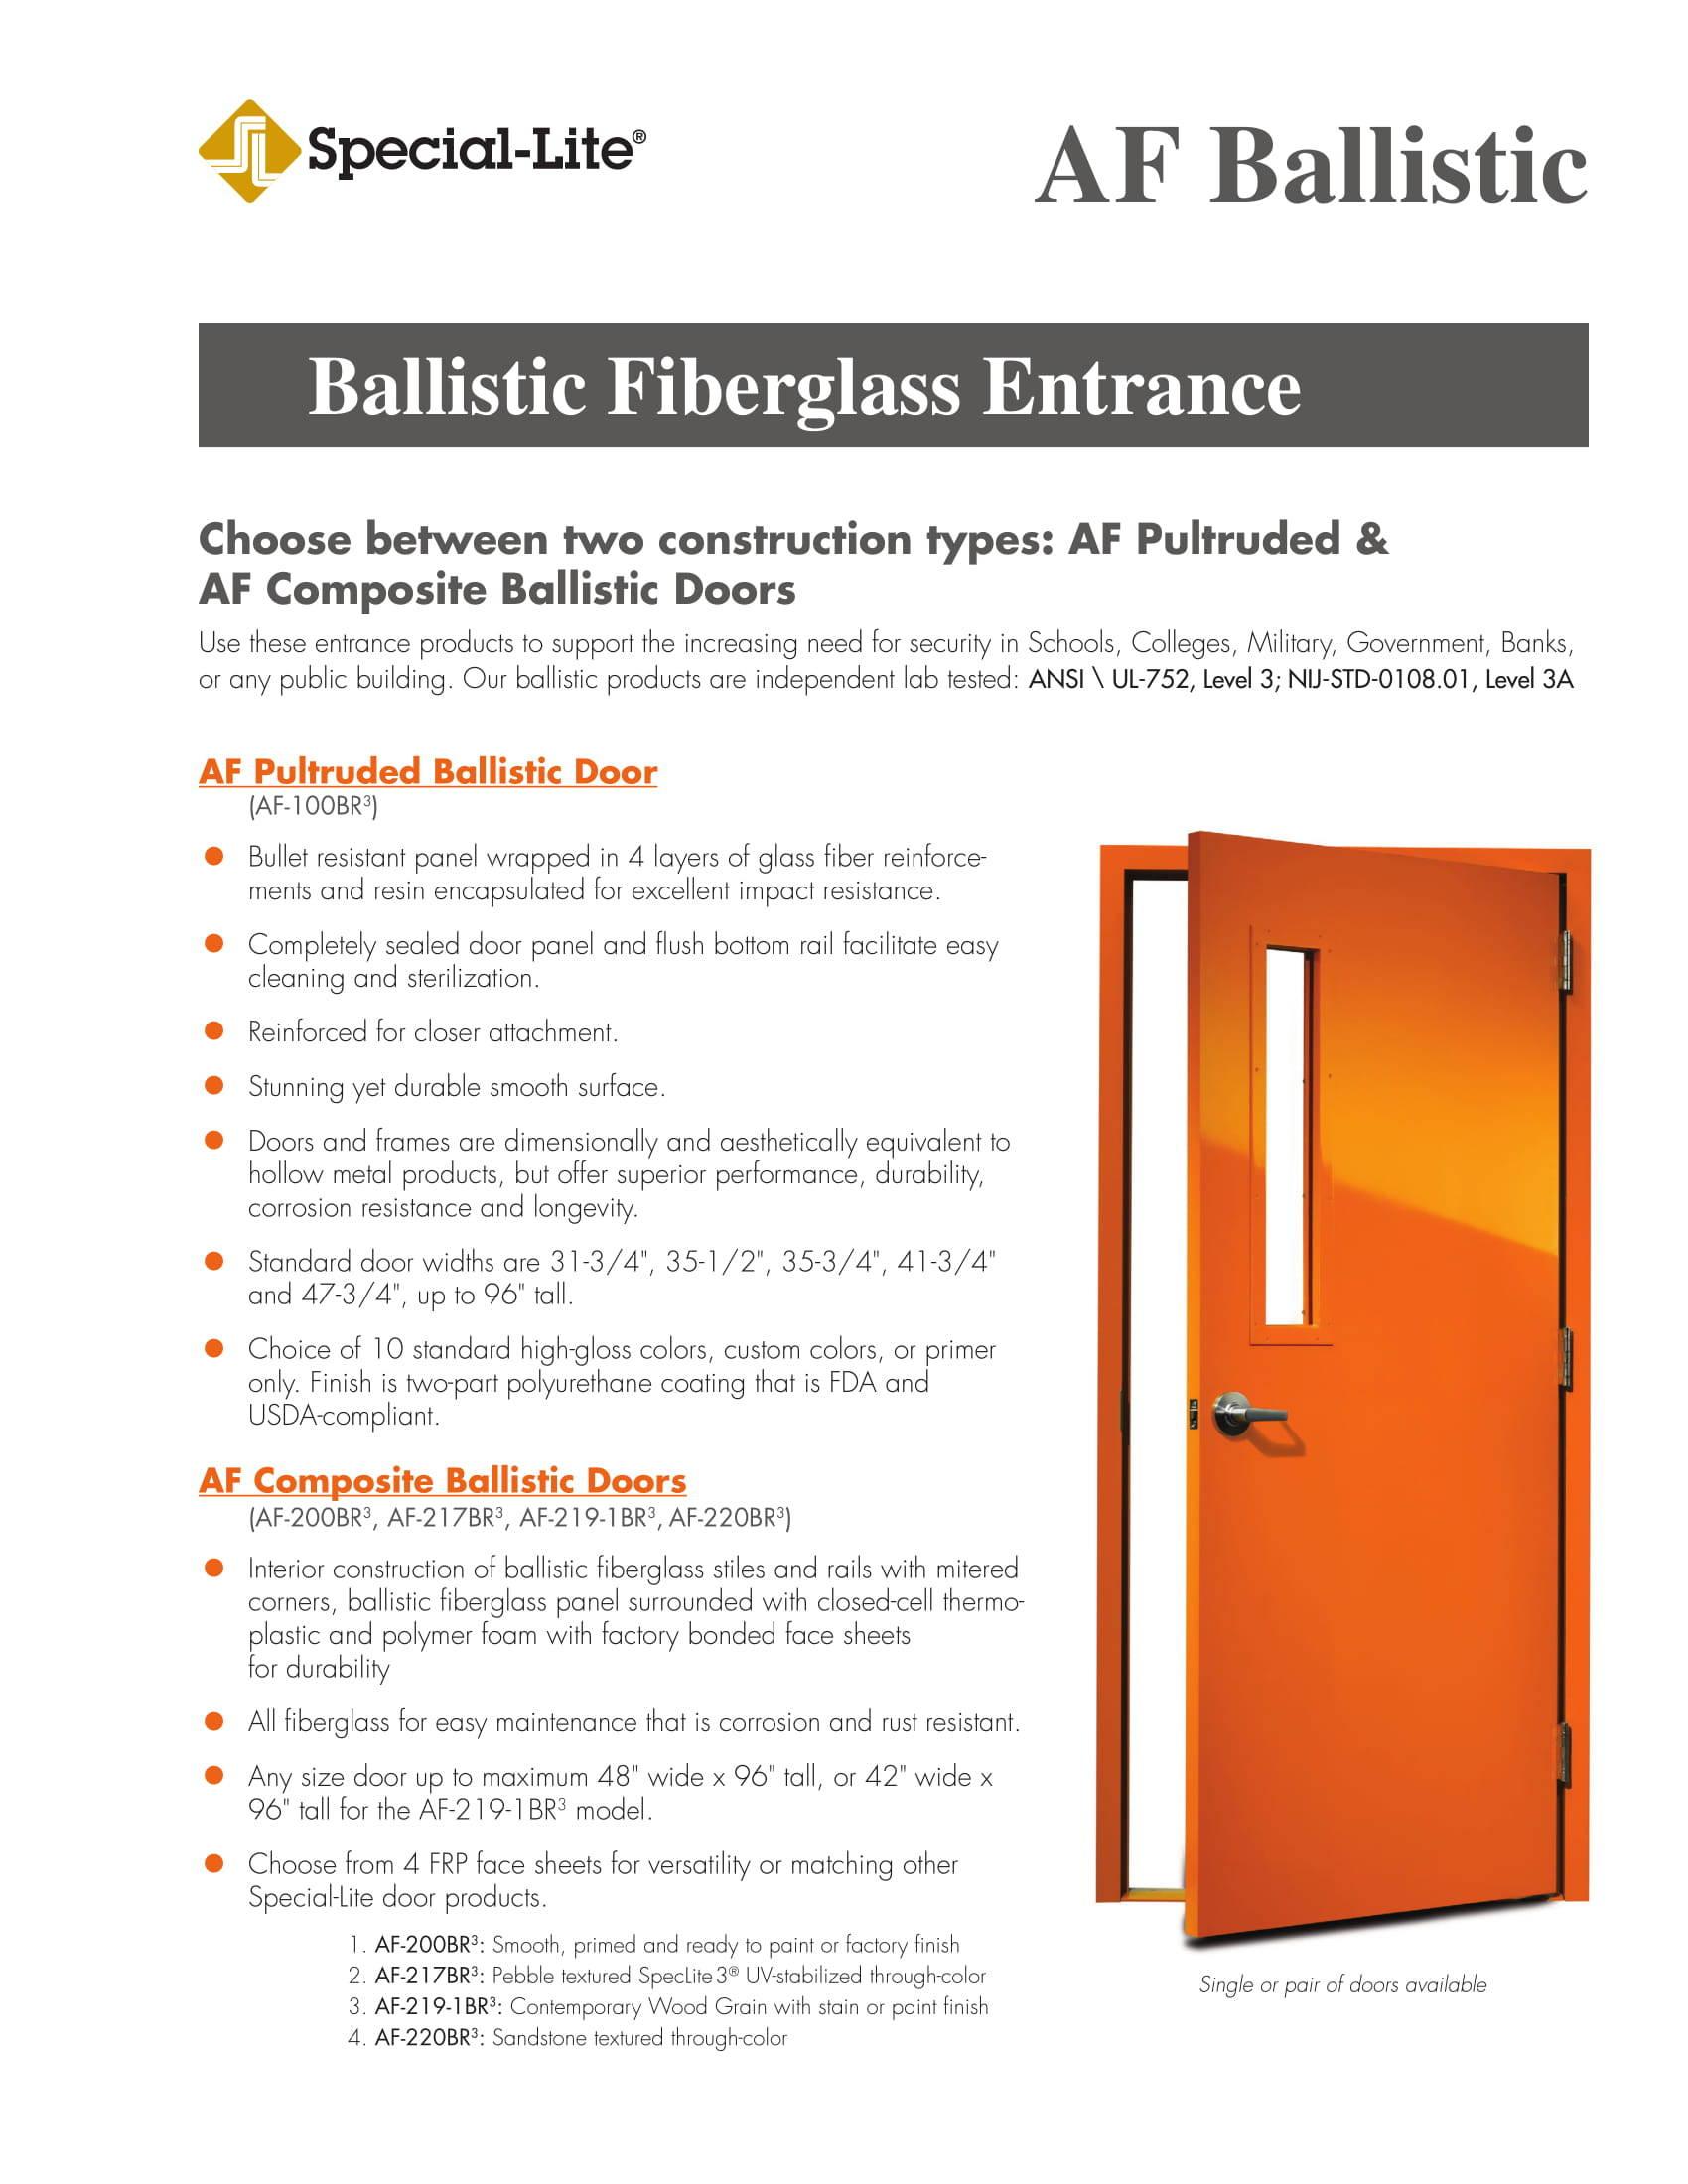 AF Ballistic Fiberglass Entrance